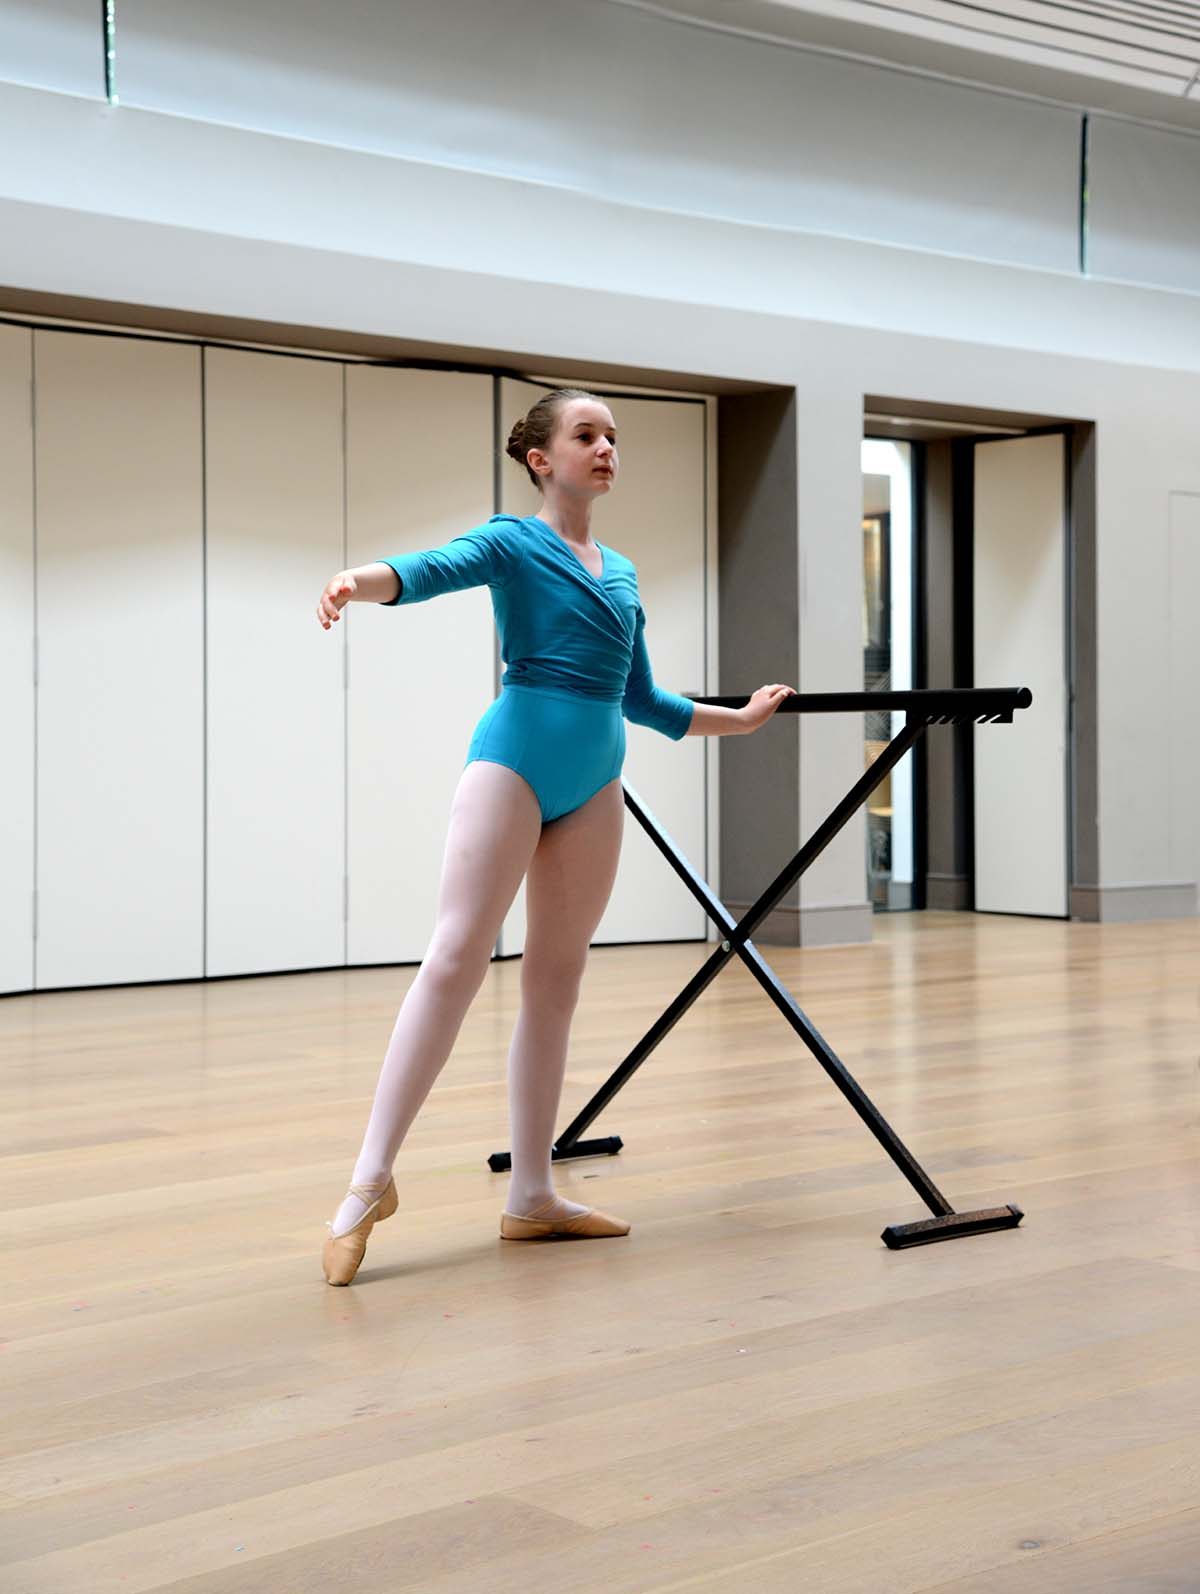 Solo Ballet Dancer